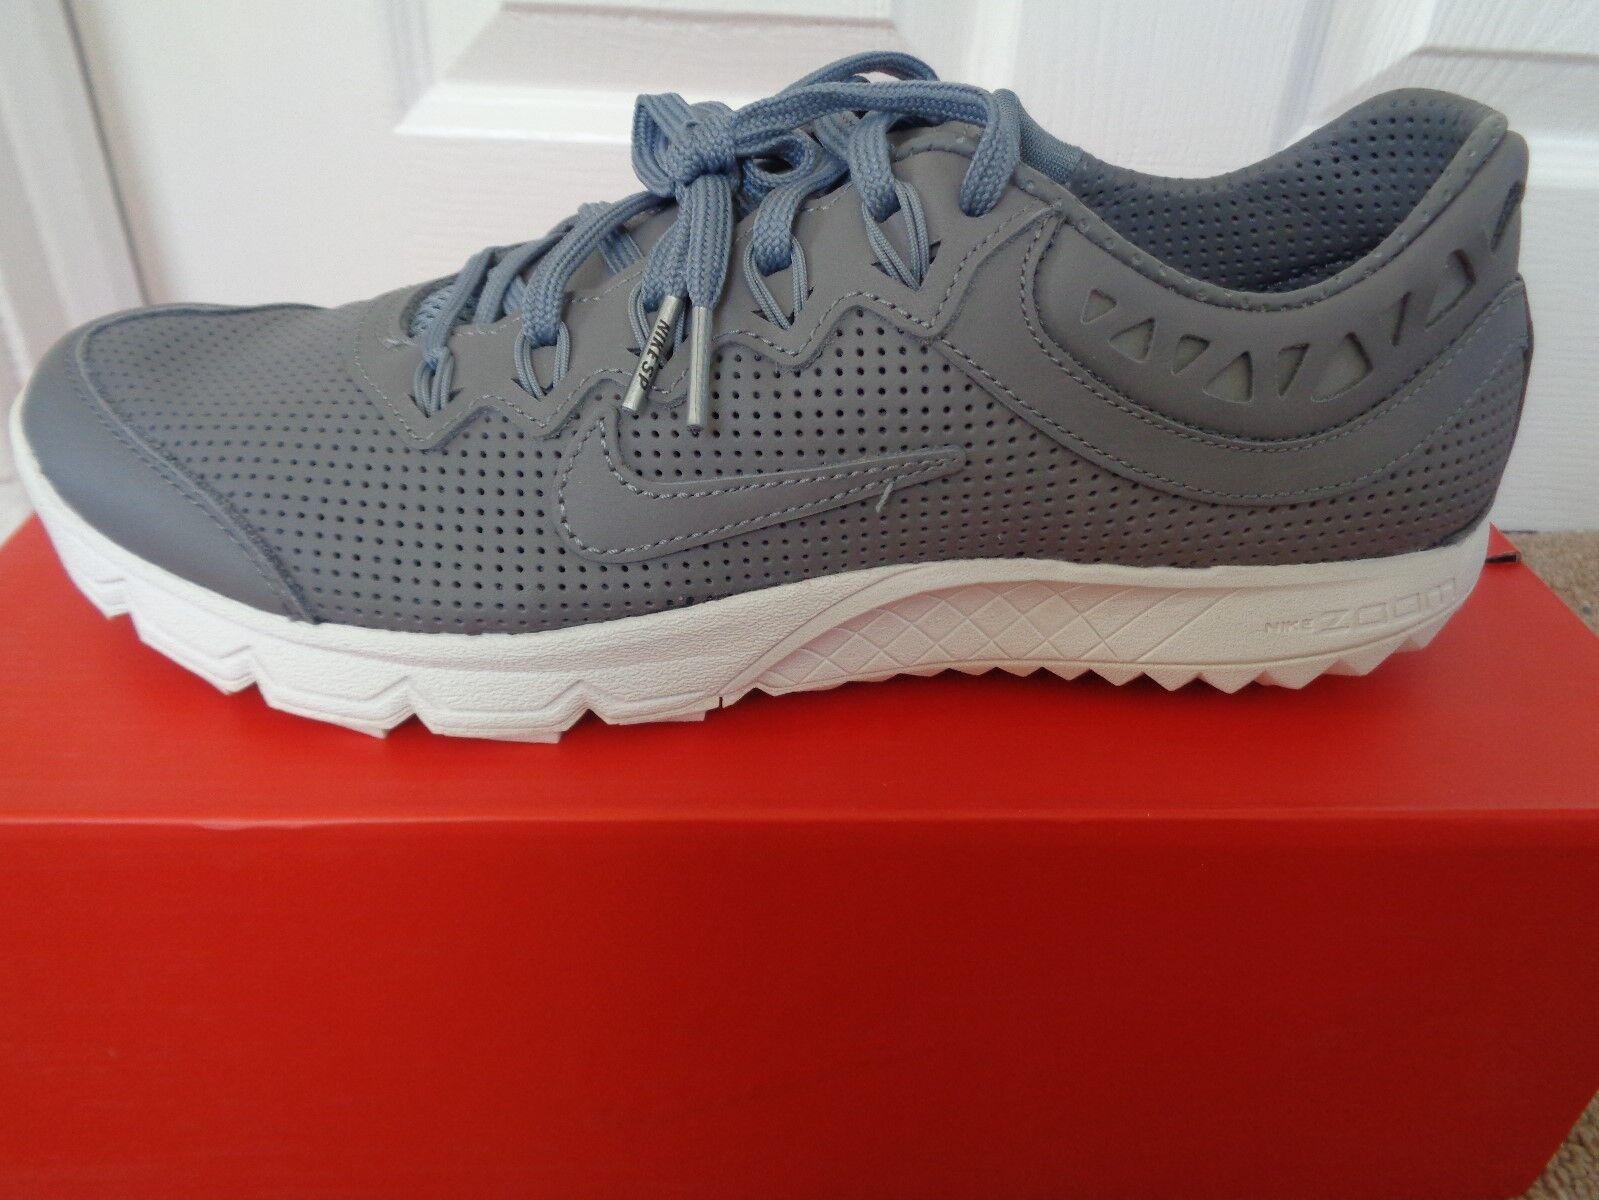 Nike Air Zoom Terra Kiger 2 Baskets 813041 001 UK 7.5 EU 42 US 8.5 Neuf + Boîte